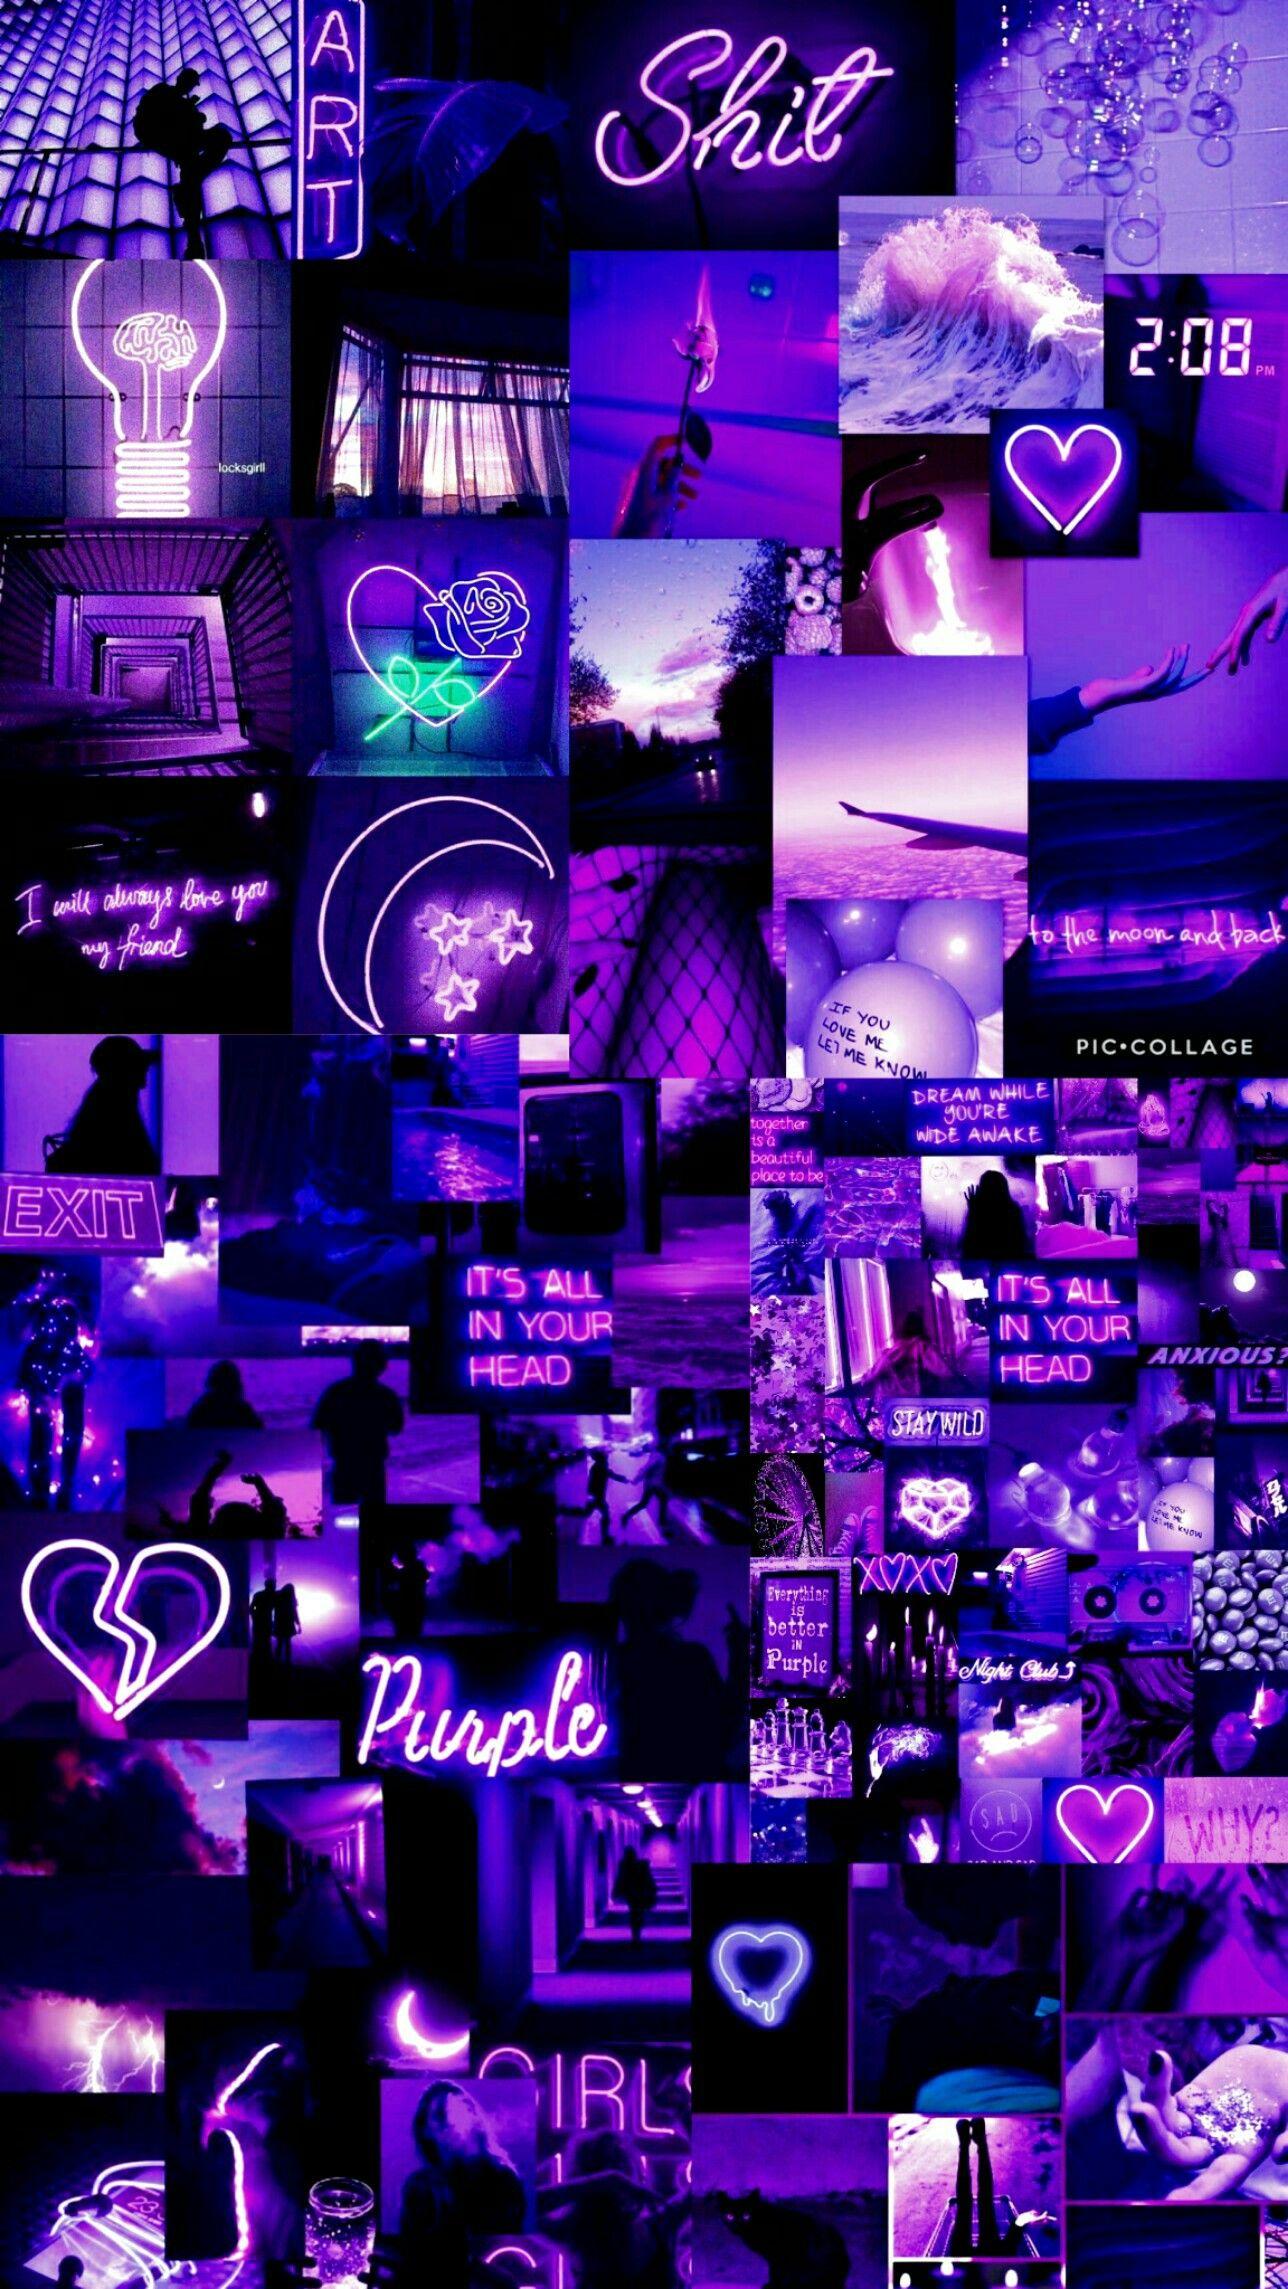 Pin By Estefani Apaza Velasco On Bts Wallpaper Iphone Neon Purple Wallpaper Iphone Purple Wallpaper Iphone bts purple wallpaper